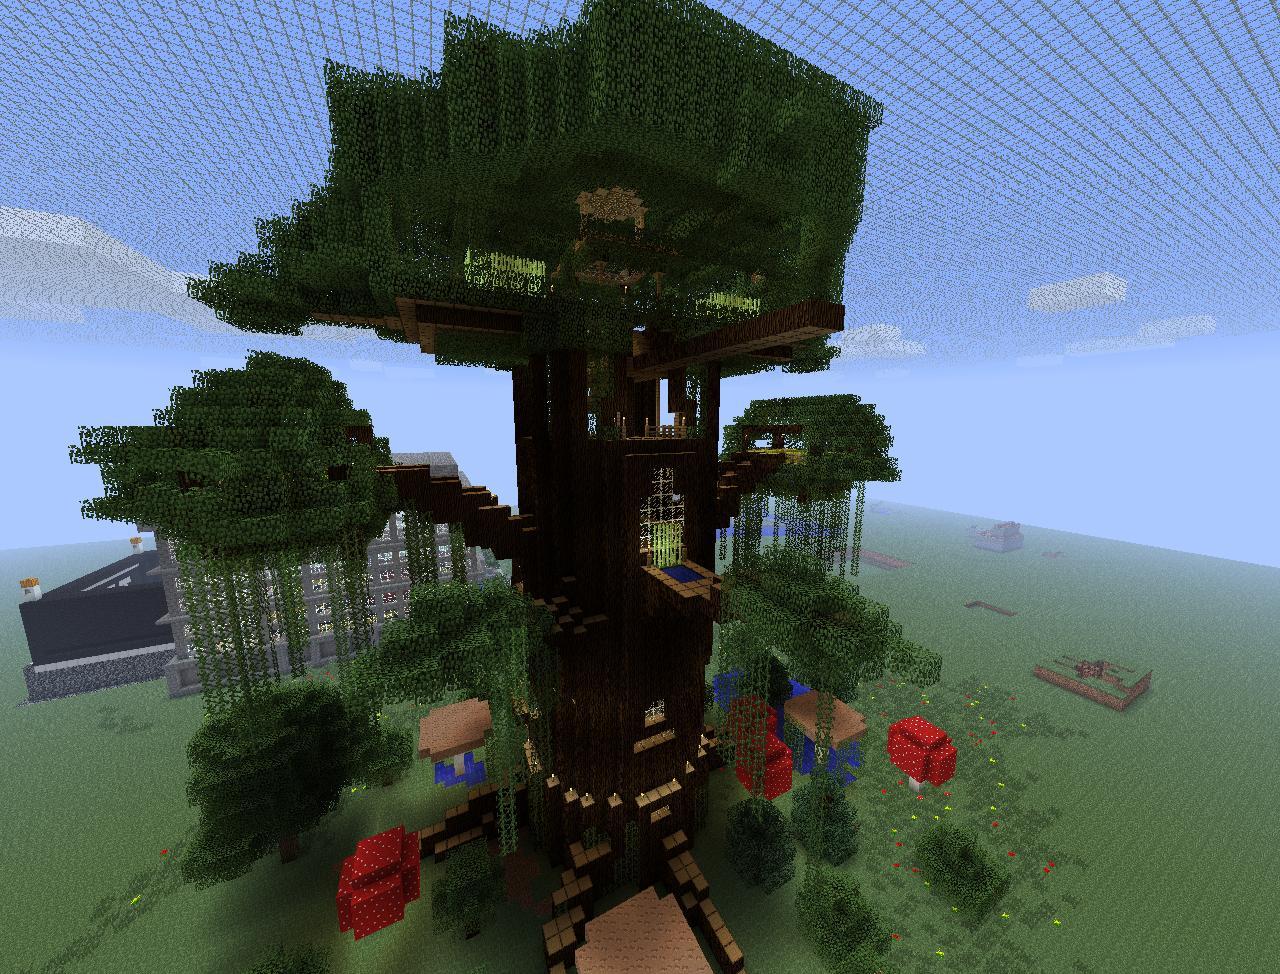 minecraft giant tree wip2 by slappyhand on deviantart